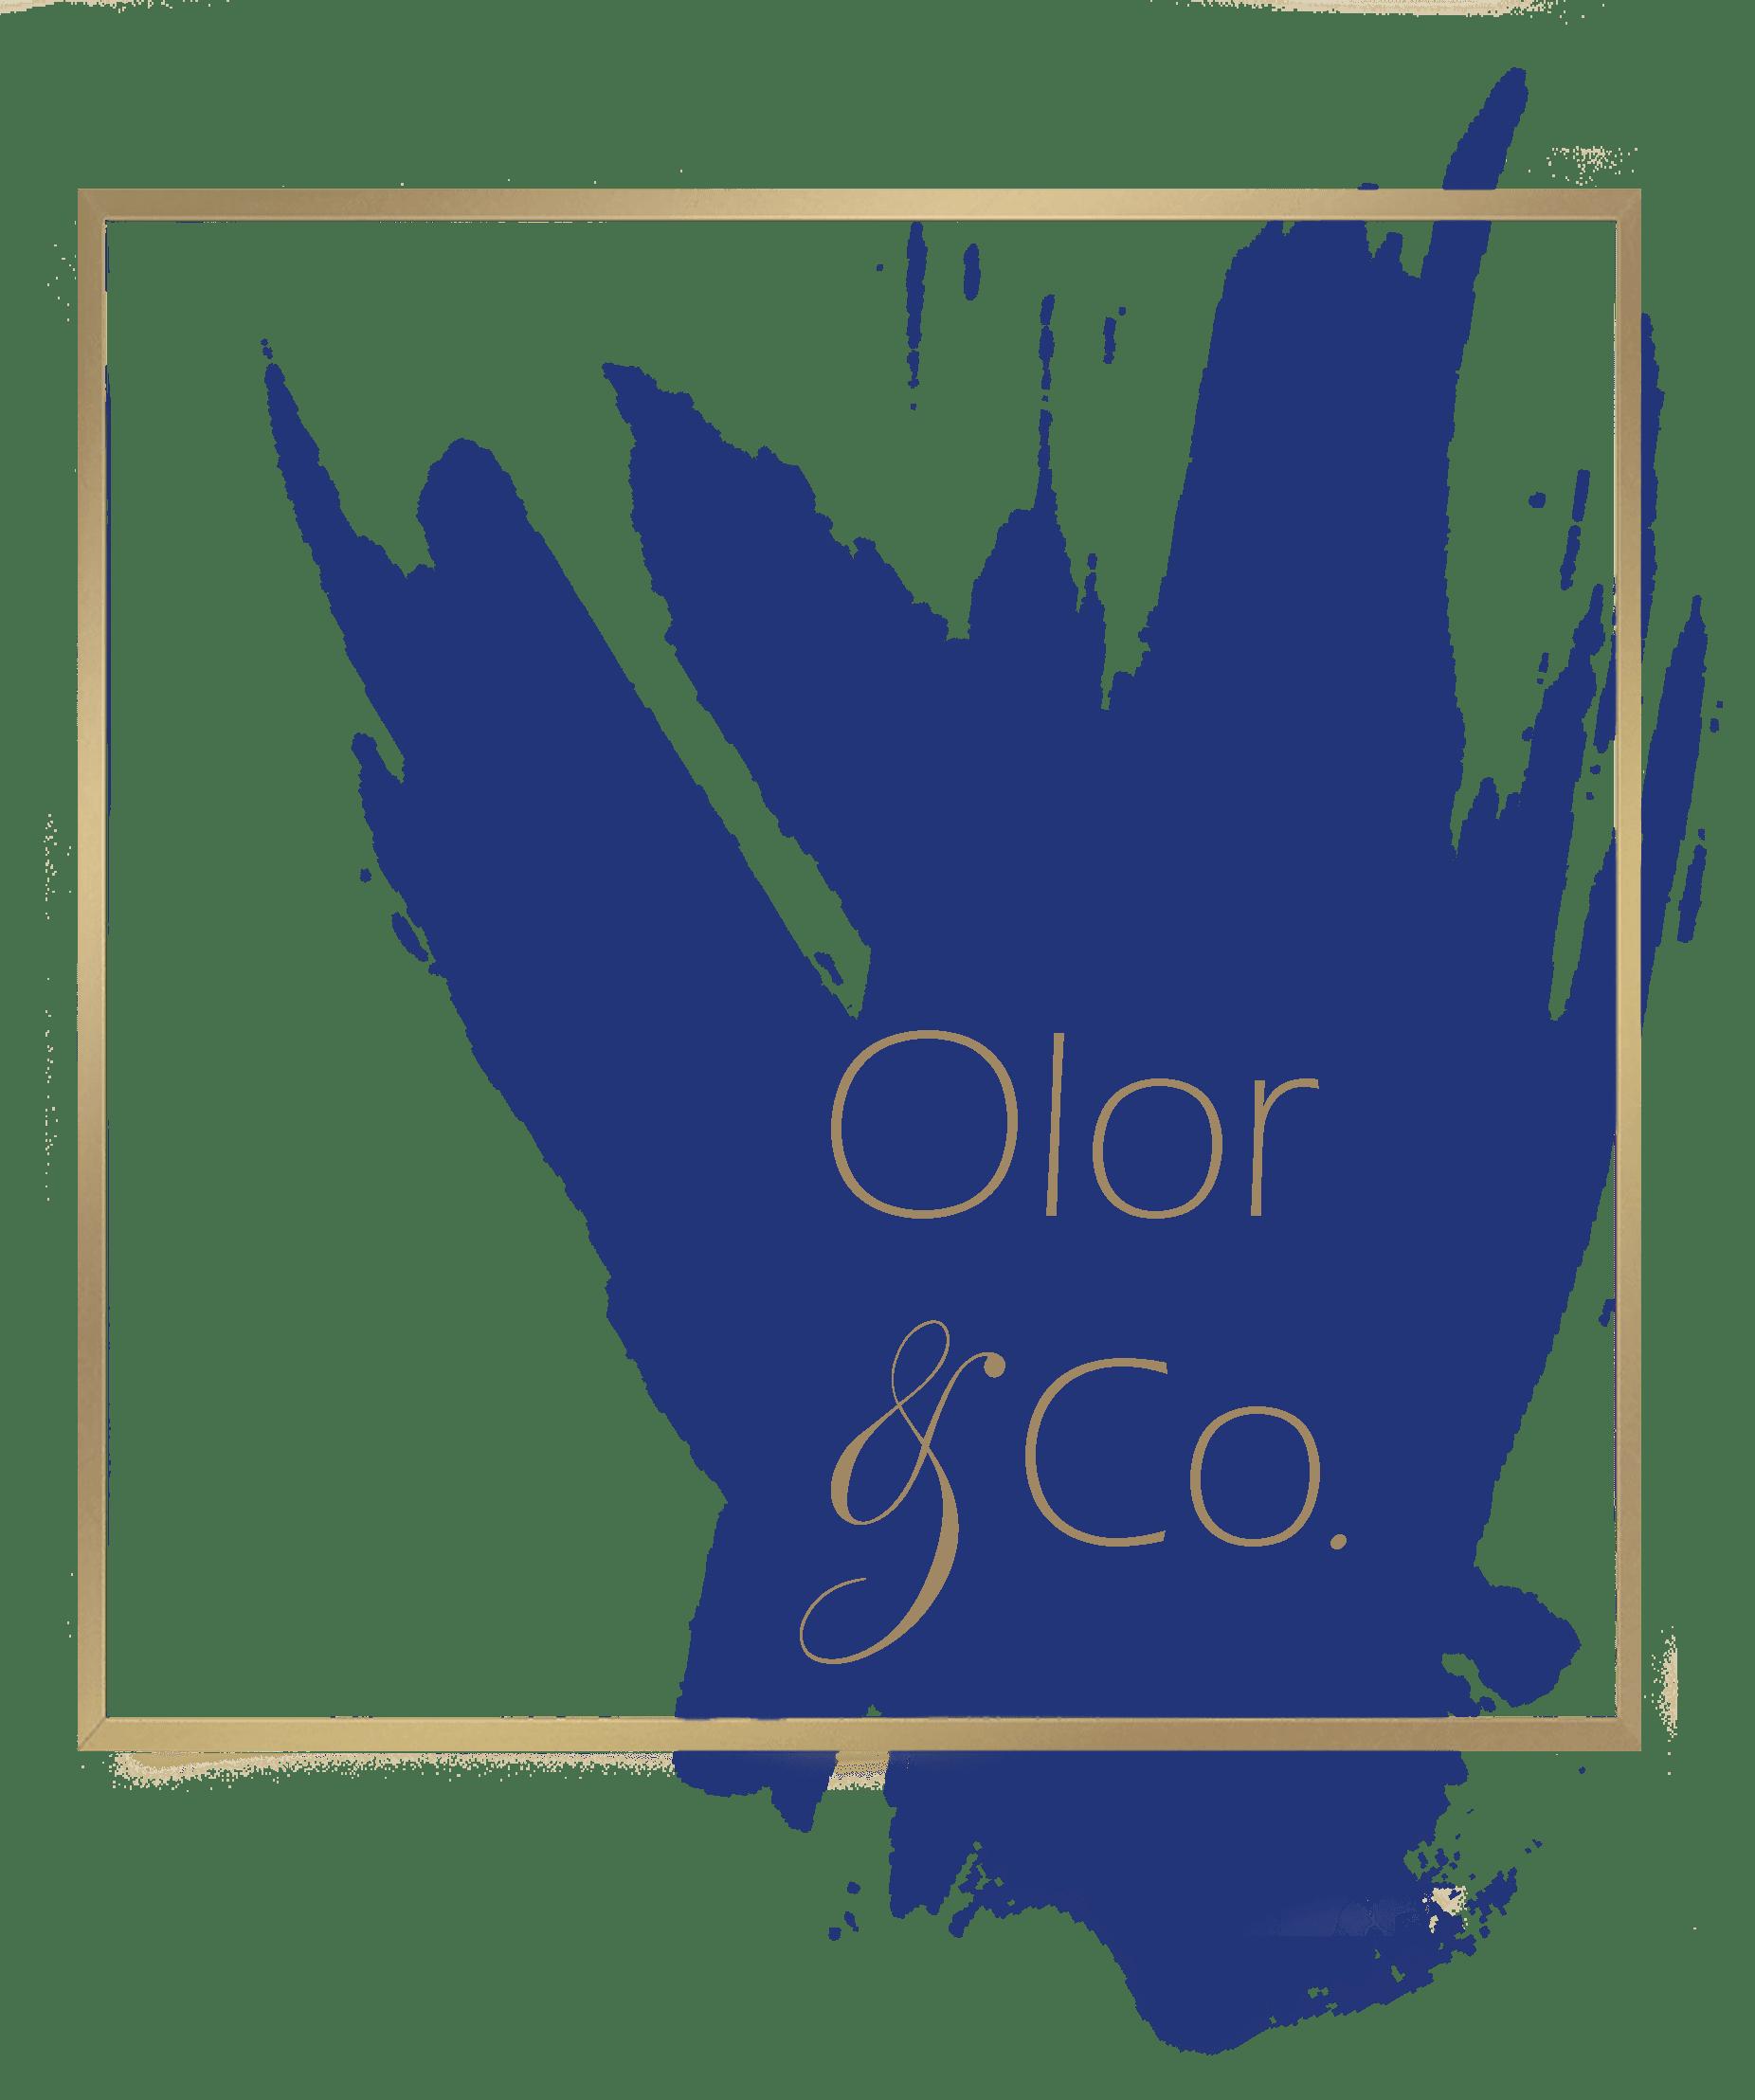 Olor & Co.